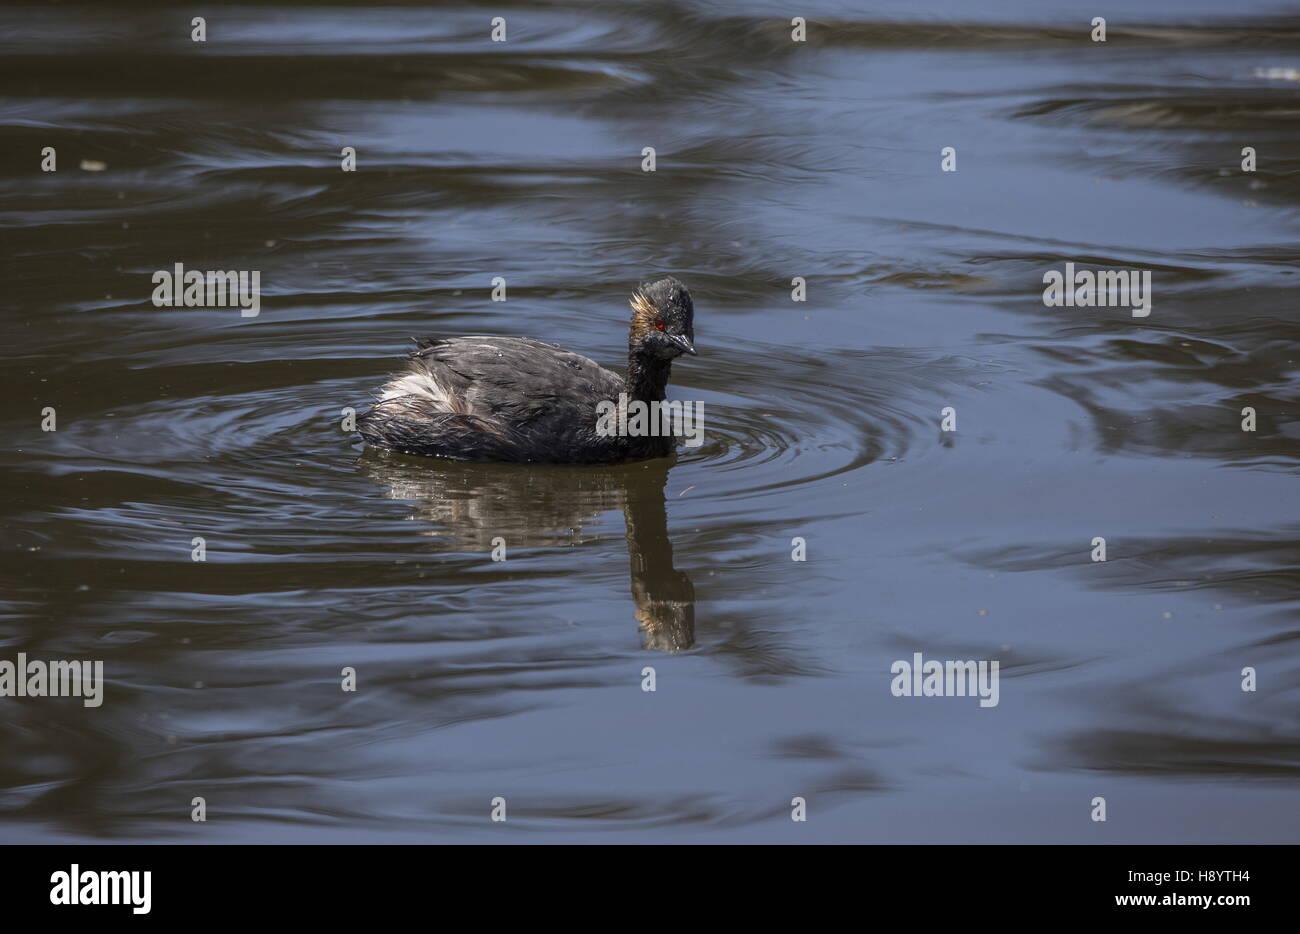 black-necked grebe, Podiceps nigricollis, in spring, in freshwater lake; transition plumage. California. - Stock Image